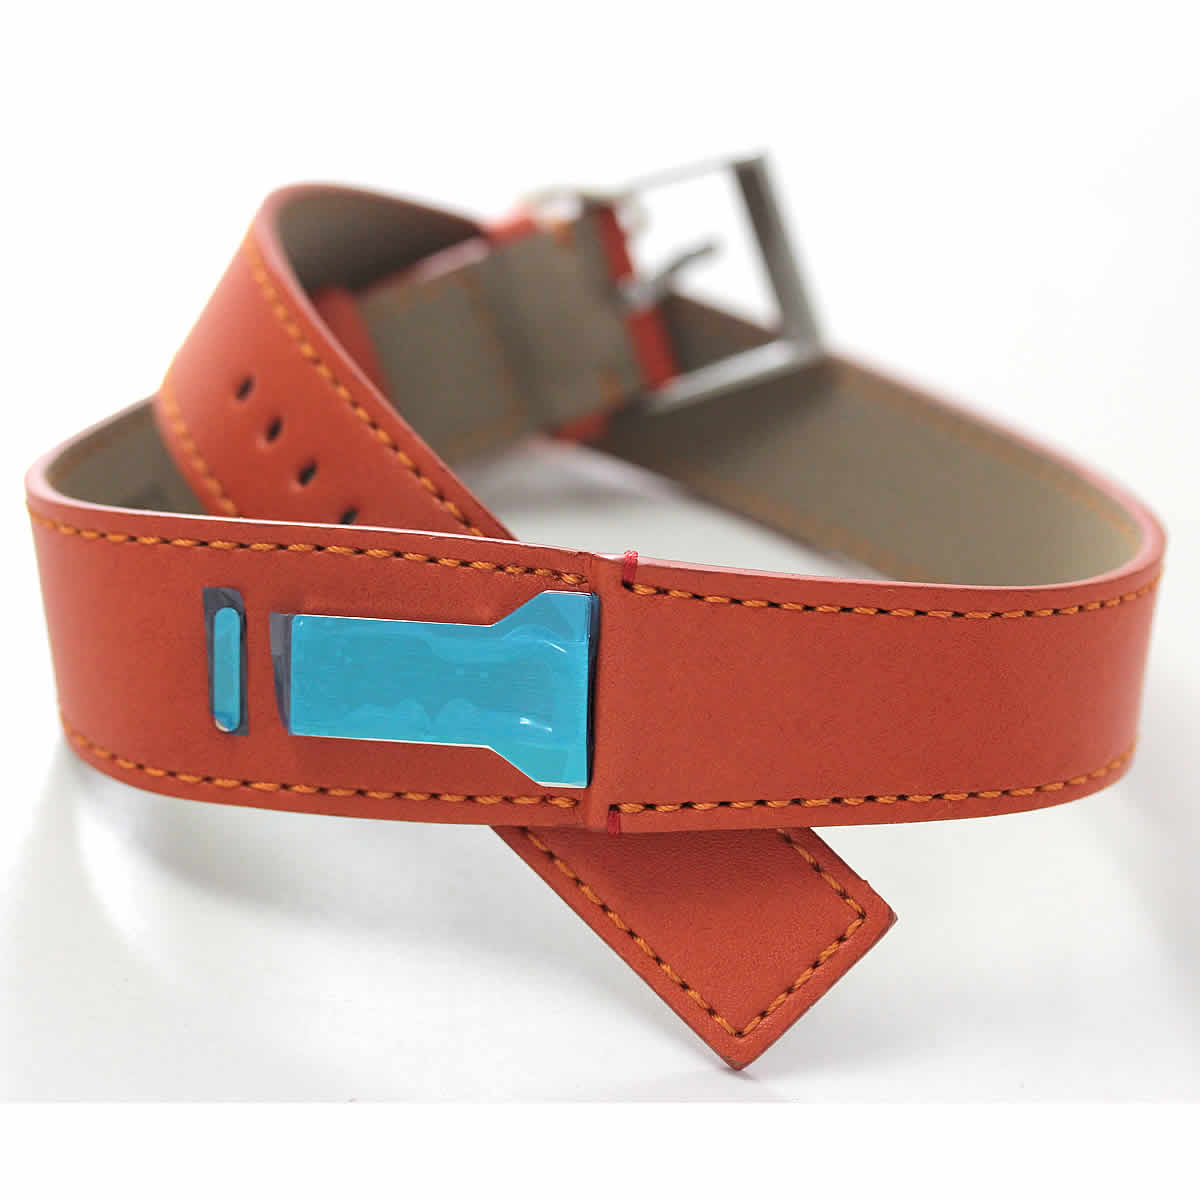 klokers(クロッカーズ)腕時計用ダブルストラップ ベルト オレンジ KLINK-02 420C8